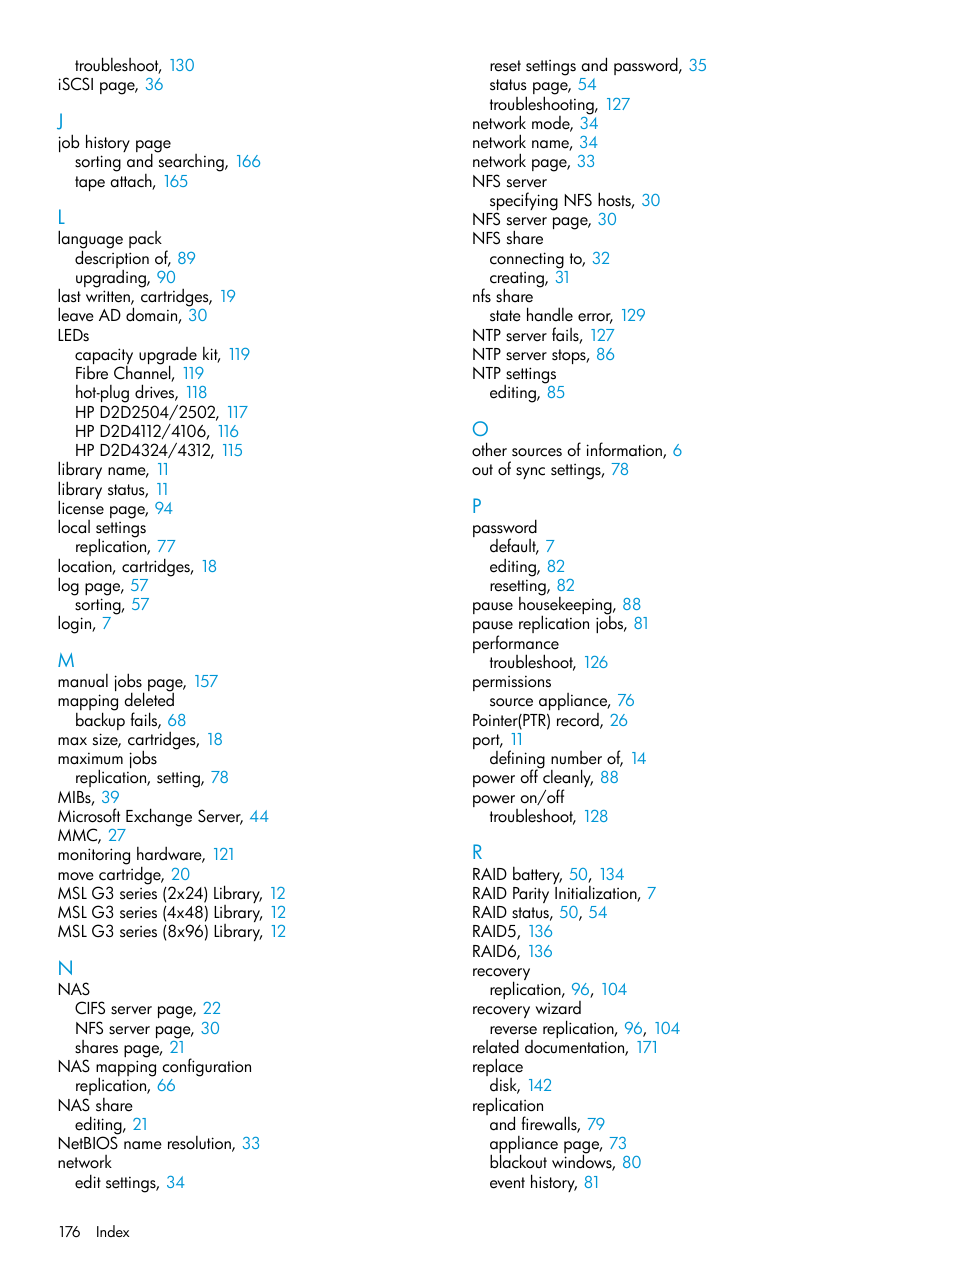 HP StoreOnce Backup User Manual | Page 176 / 178